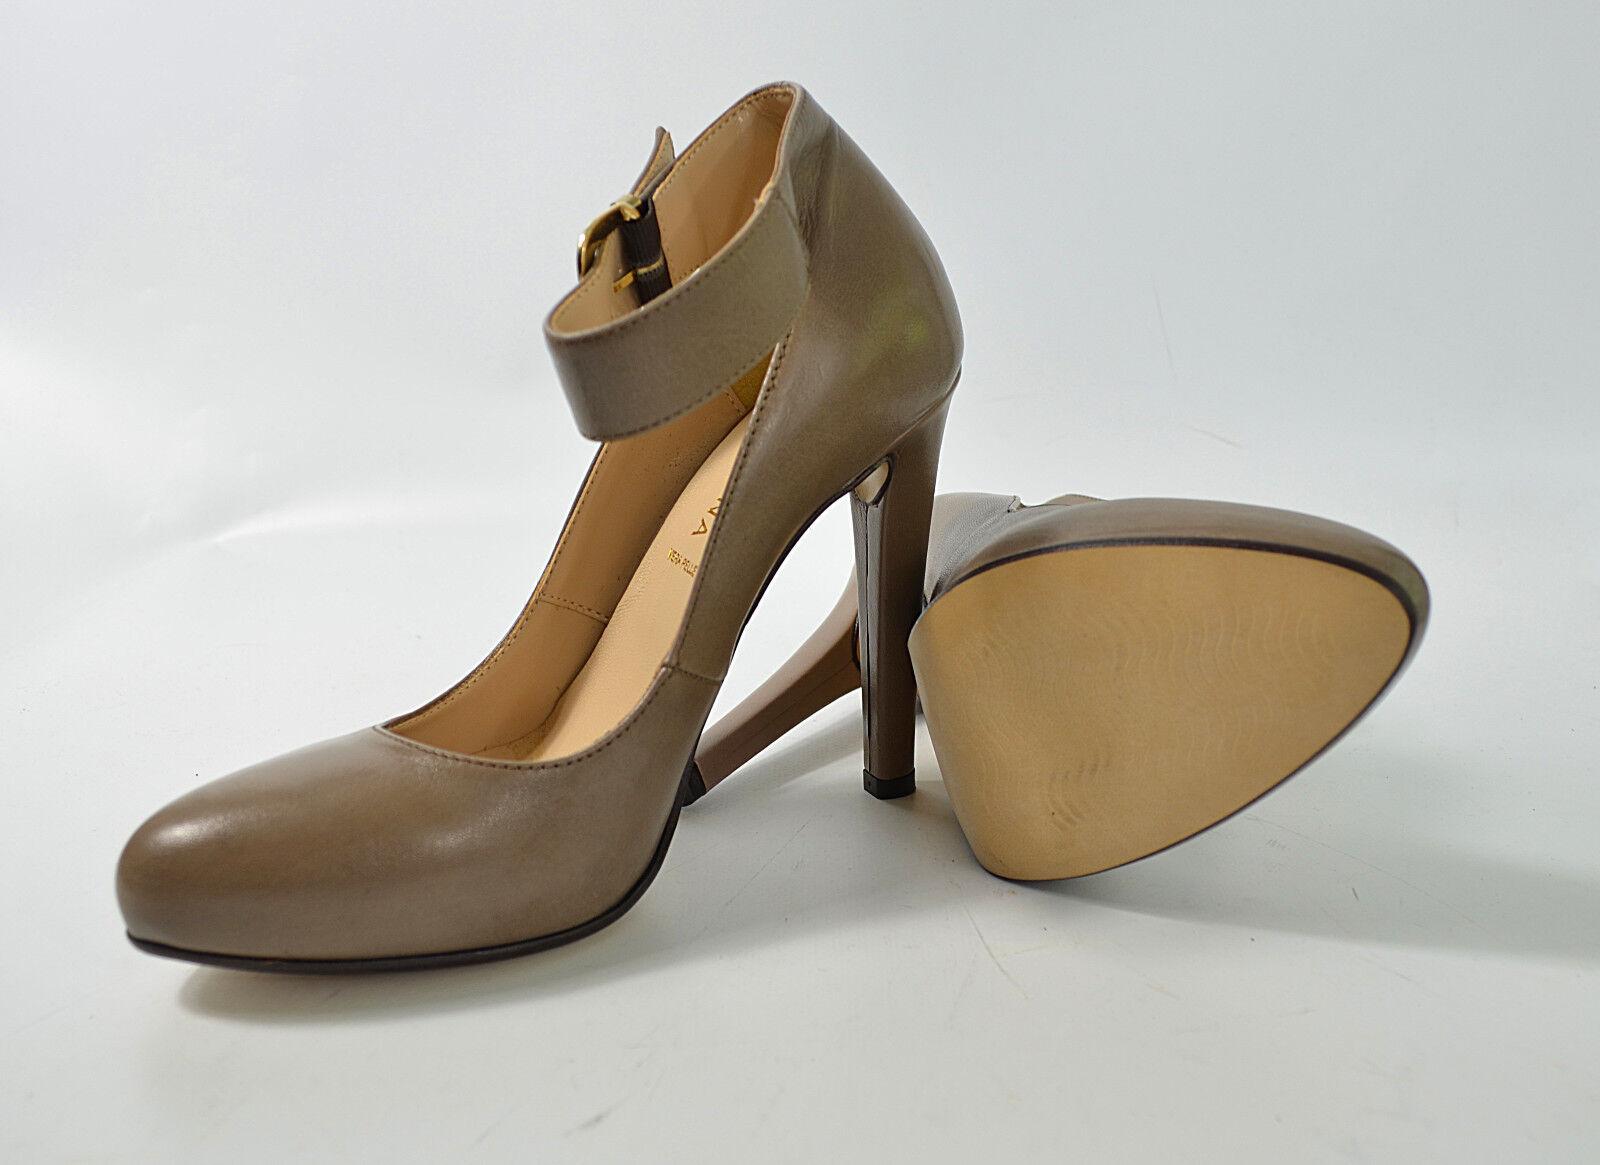 SAN MARINA Flamba Gr. 39 Pumps,   Damen Schuhe (S) 5/17 M3